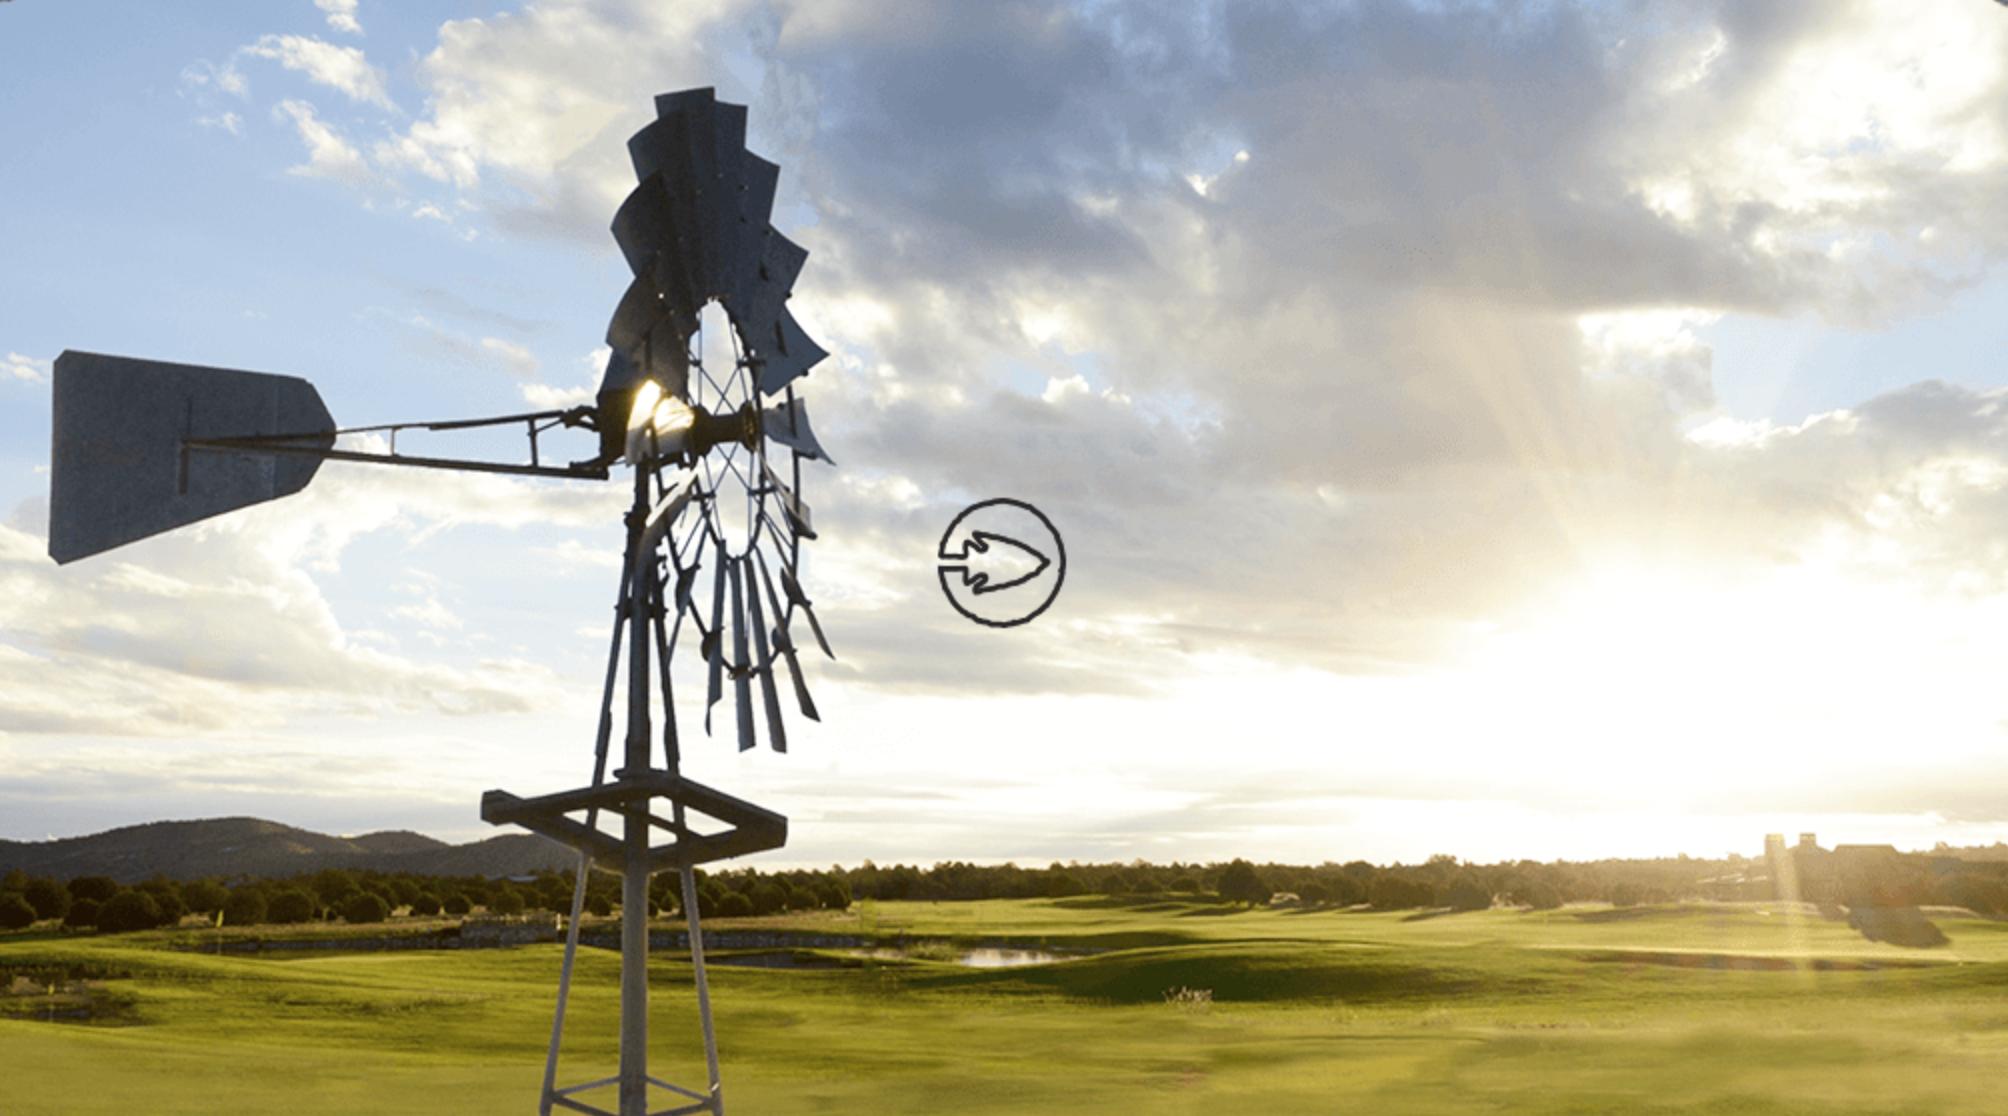 commercial for private, gated golf community in prescott, arizona